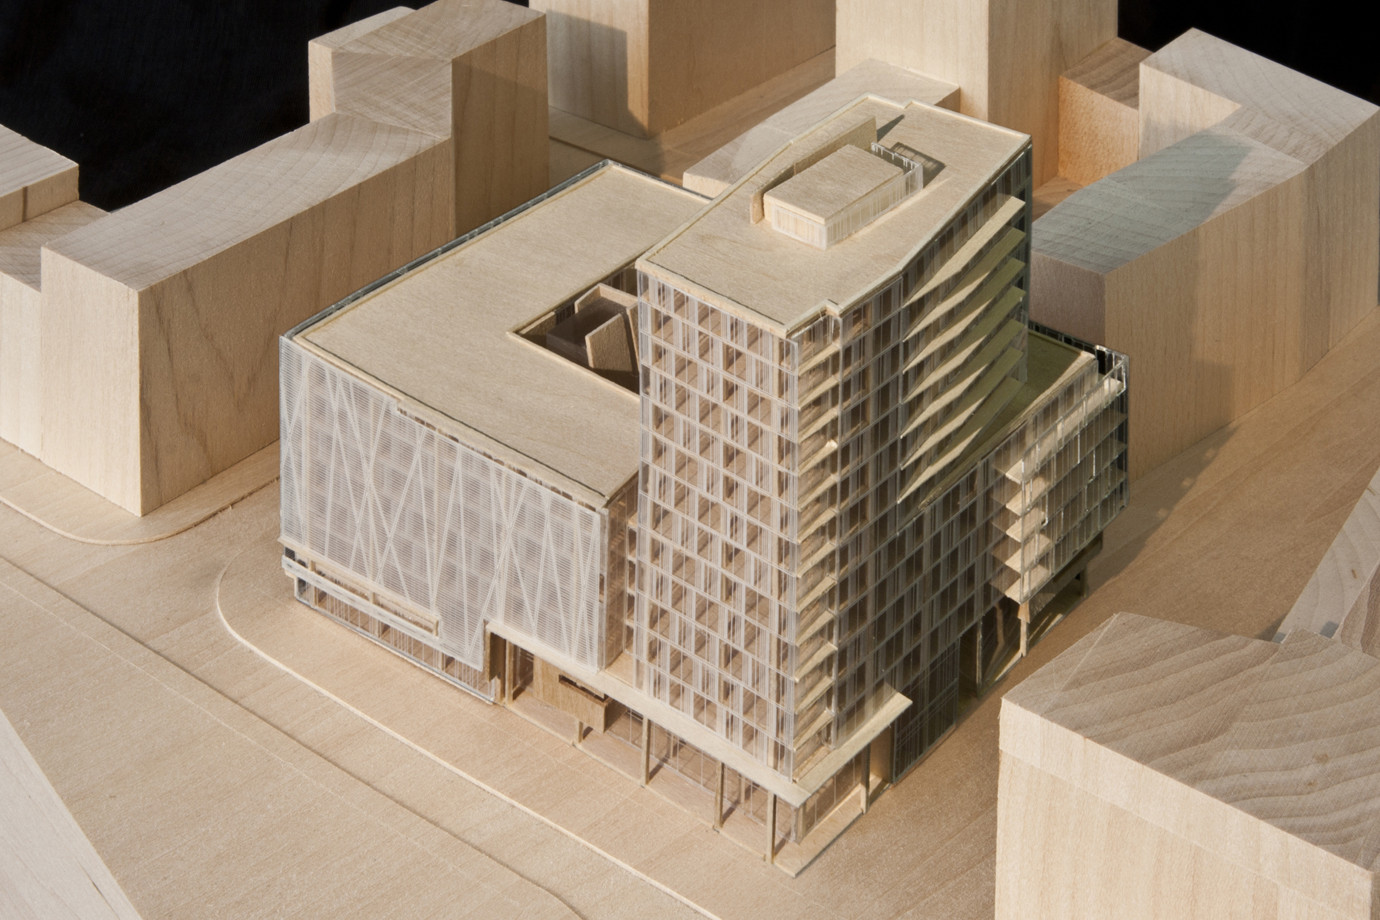 gallery of engel v lkers new headquarters richard meier partners 3. Black Bedroom Furniture Sets. Home Design Ideas